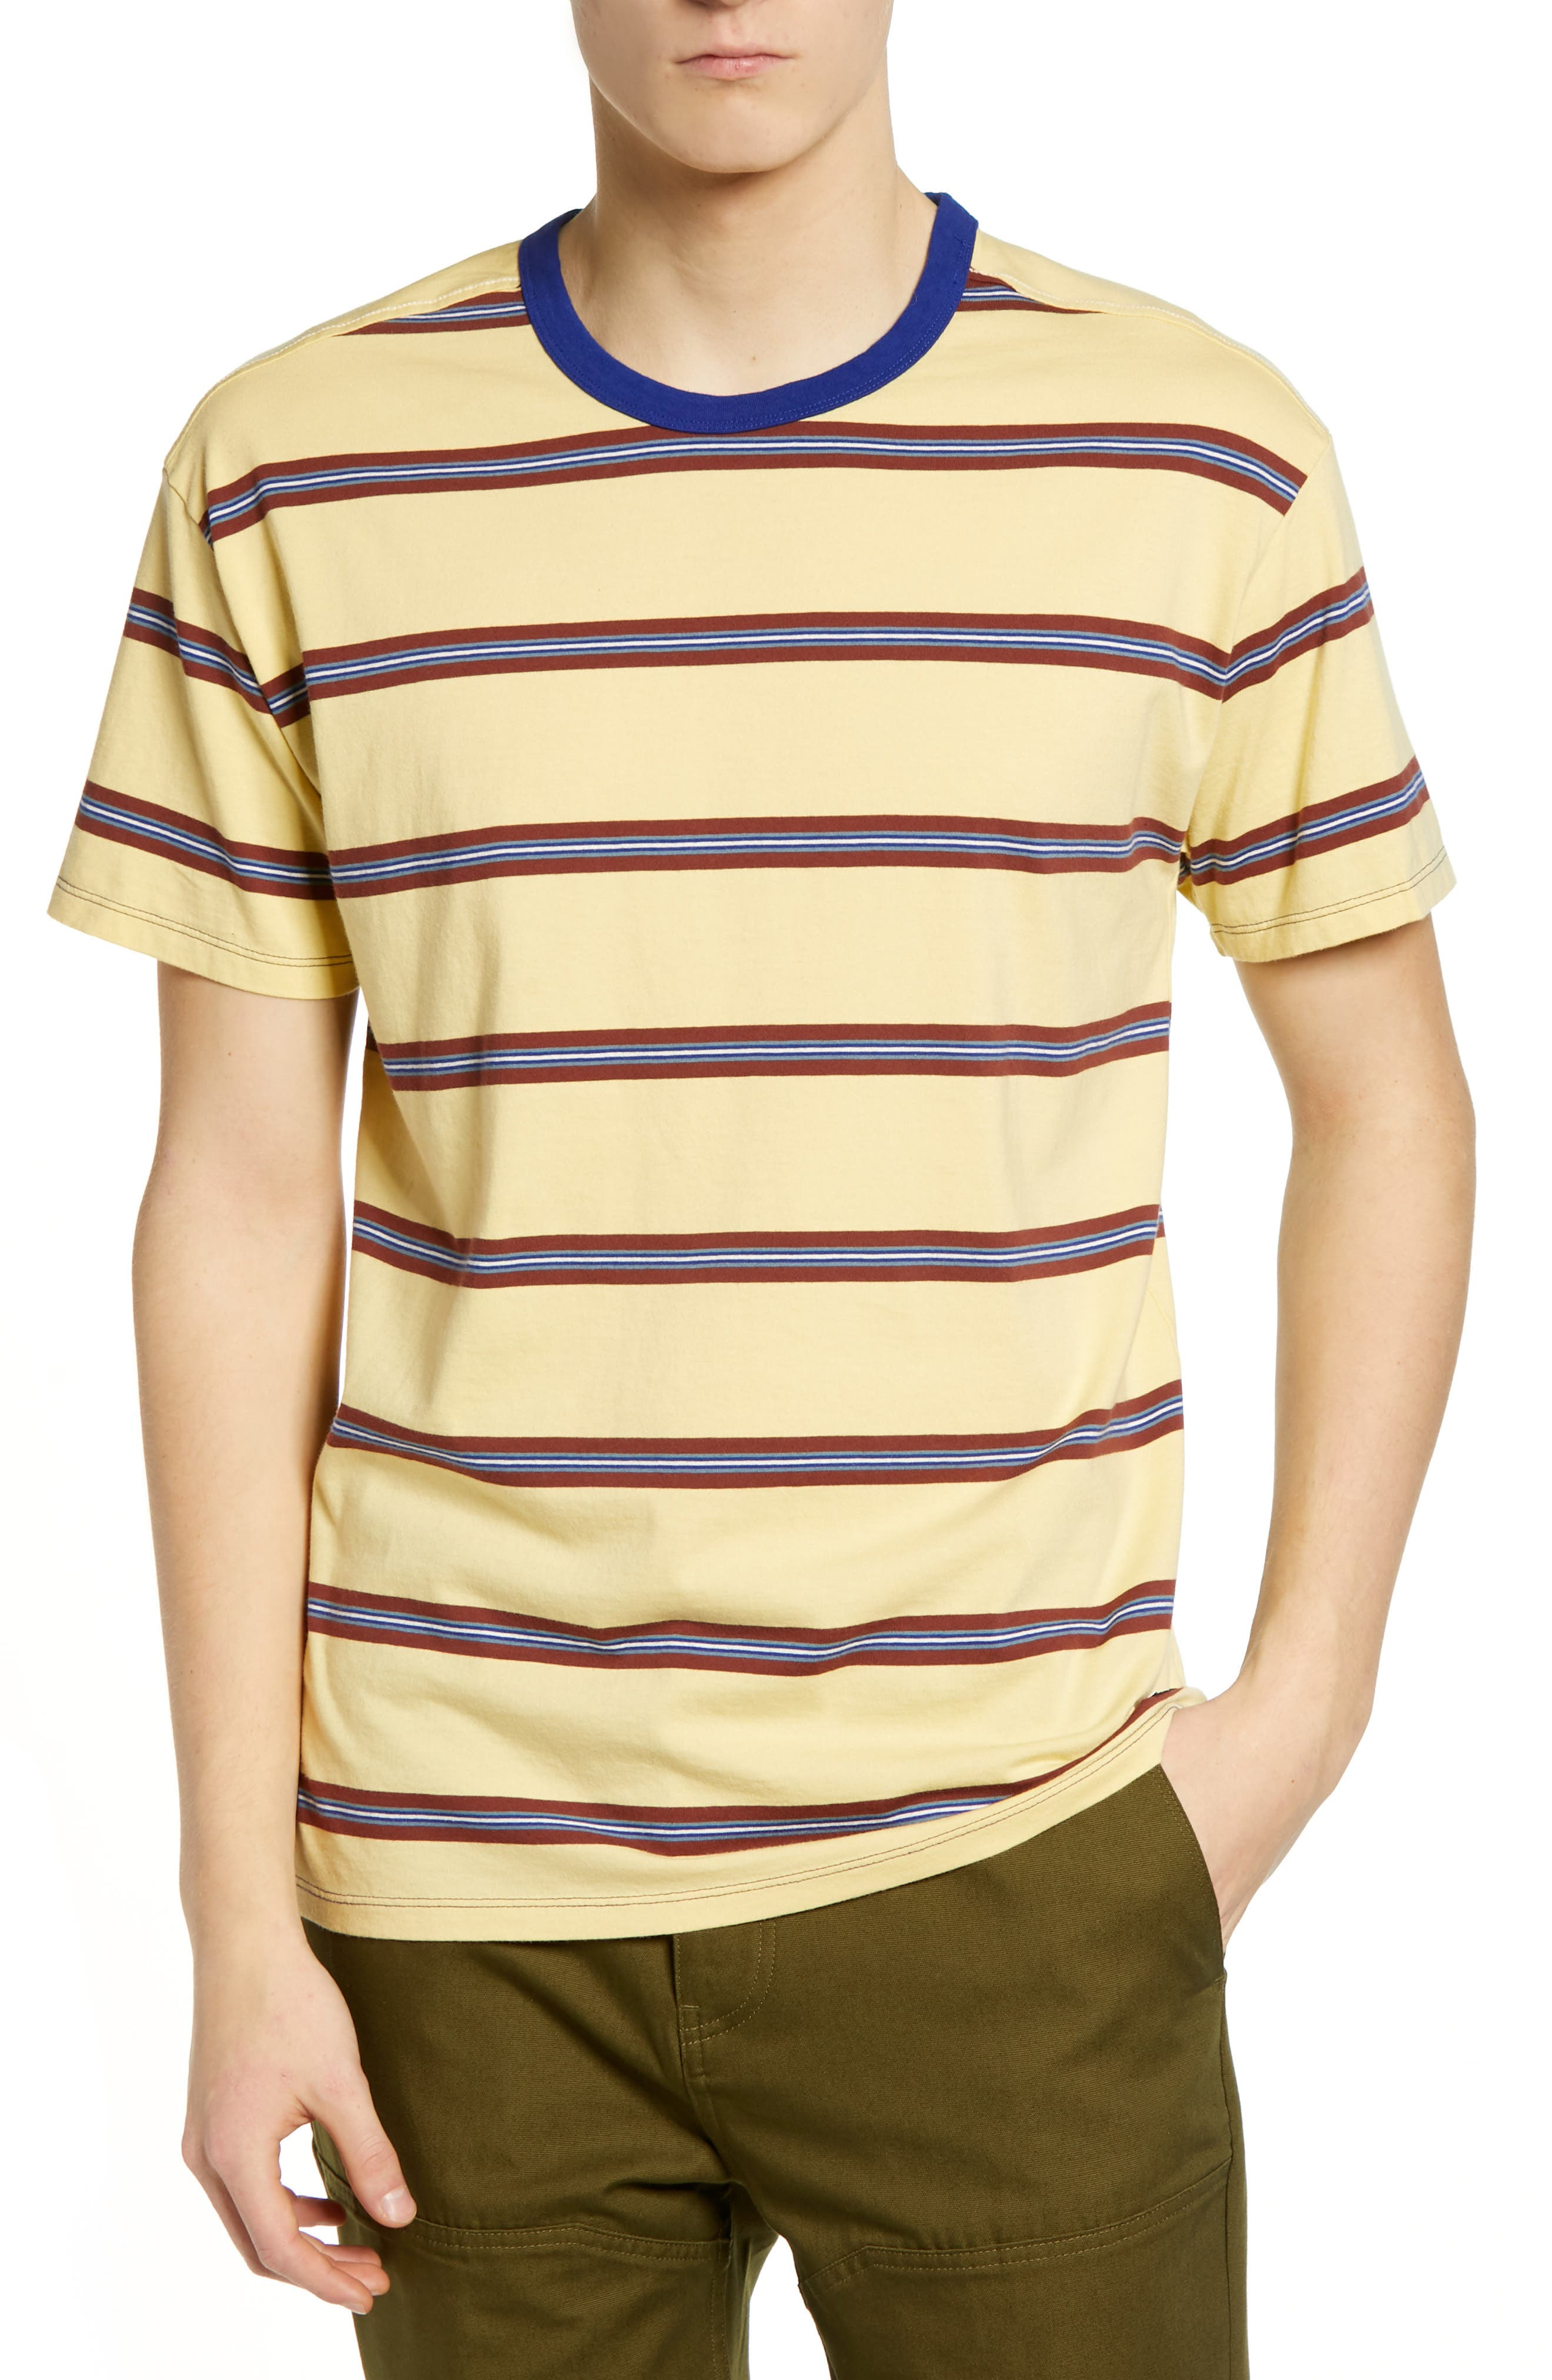 Hurley Salton Stripe T-Shirt, Yellow